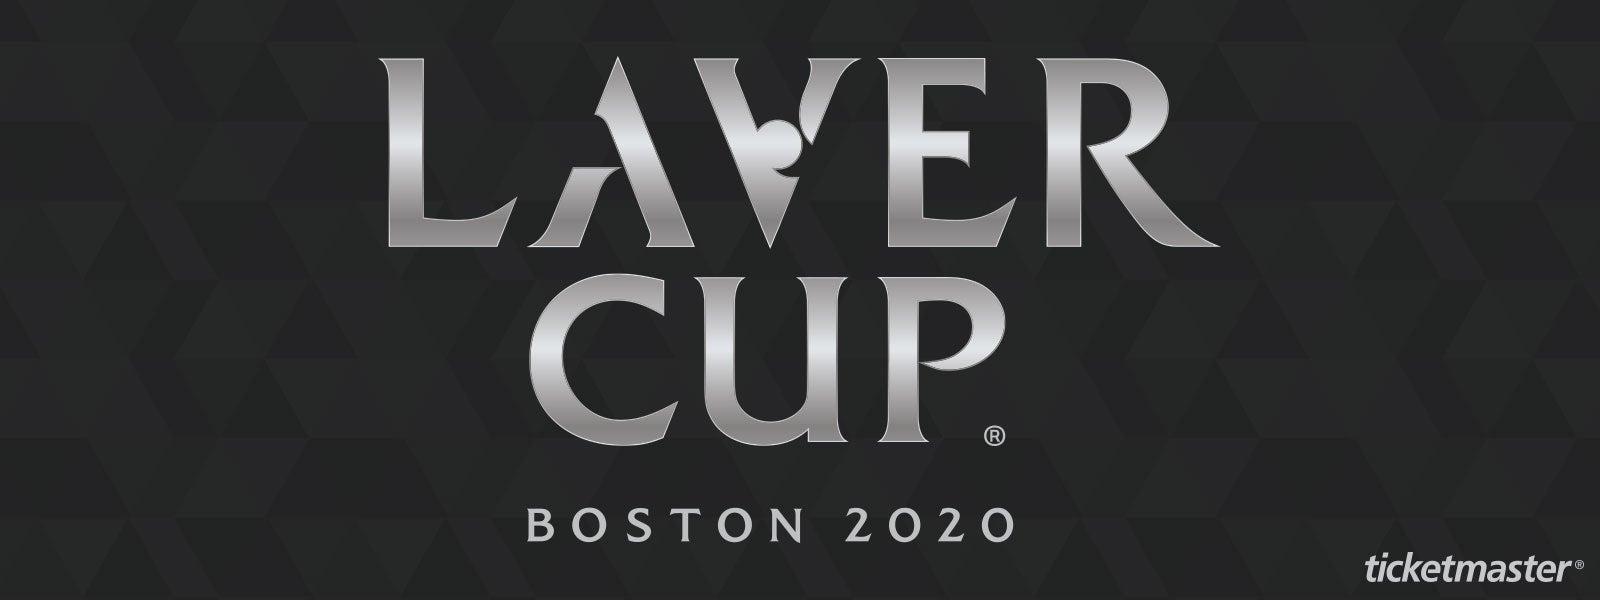 Laver Cup Intro